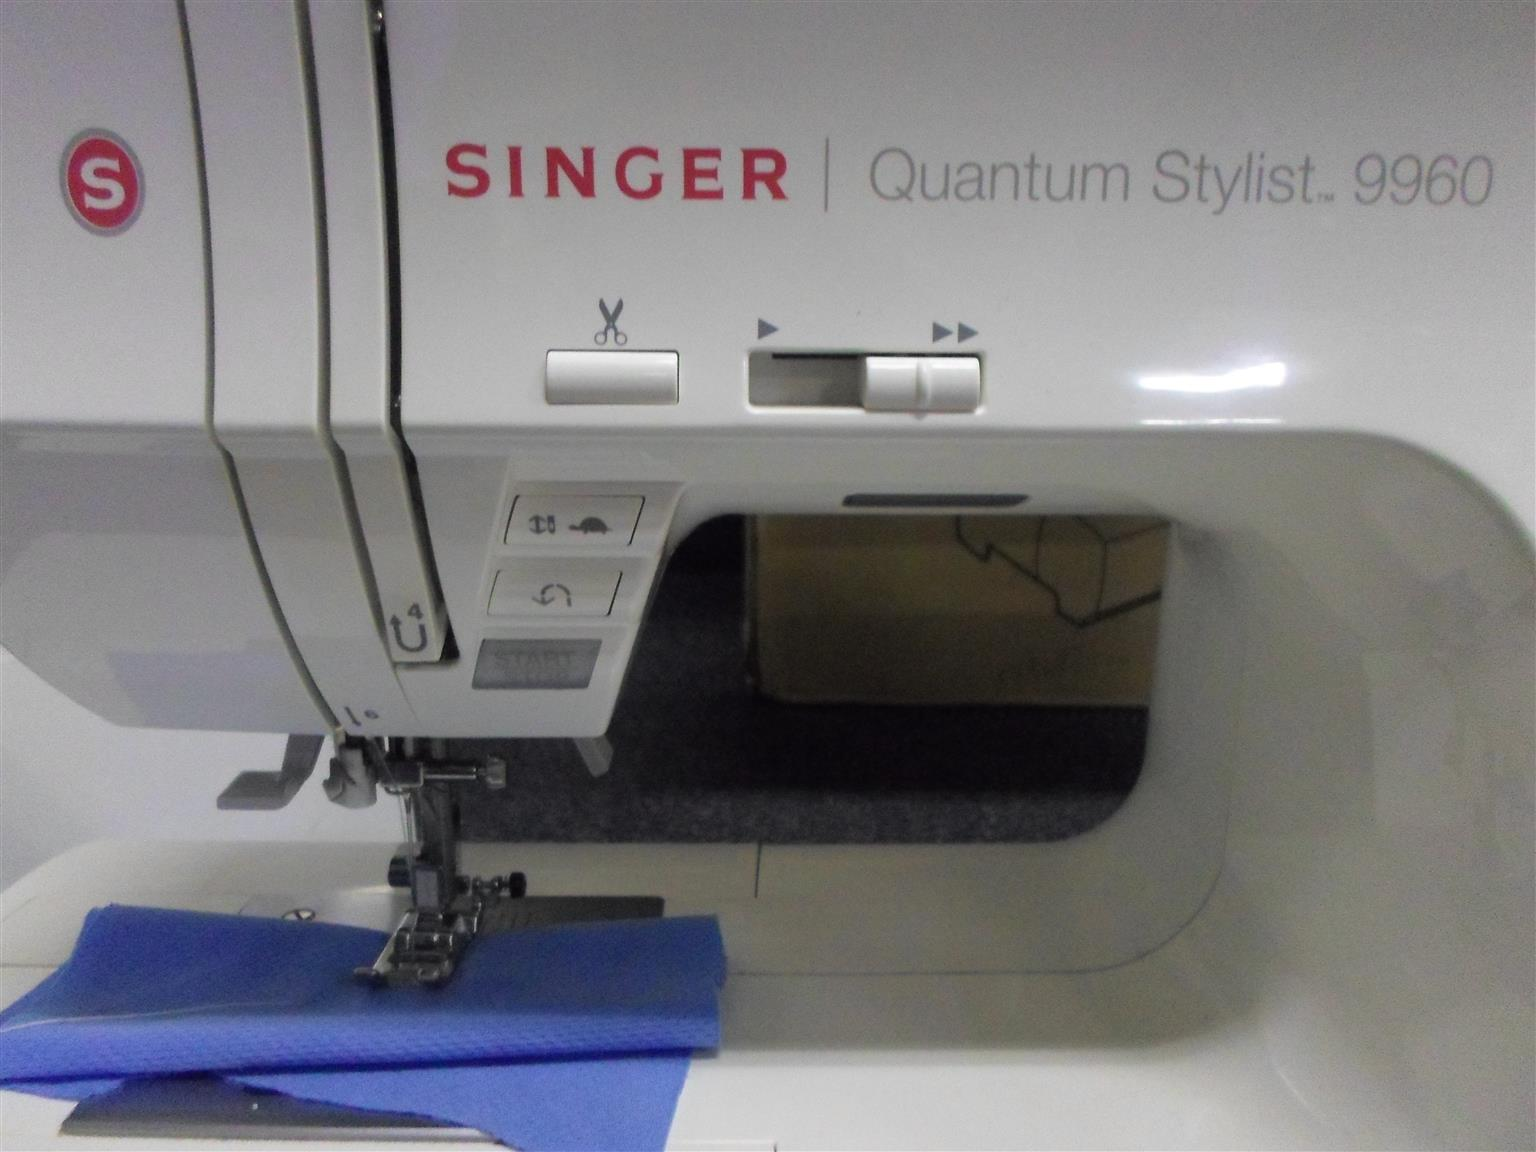 Singer Quantam Stylist 9960 Sewing Machine